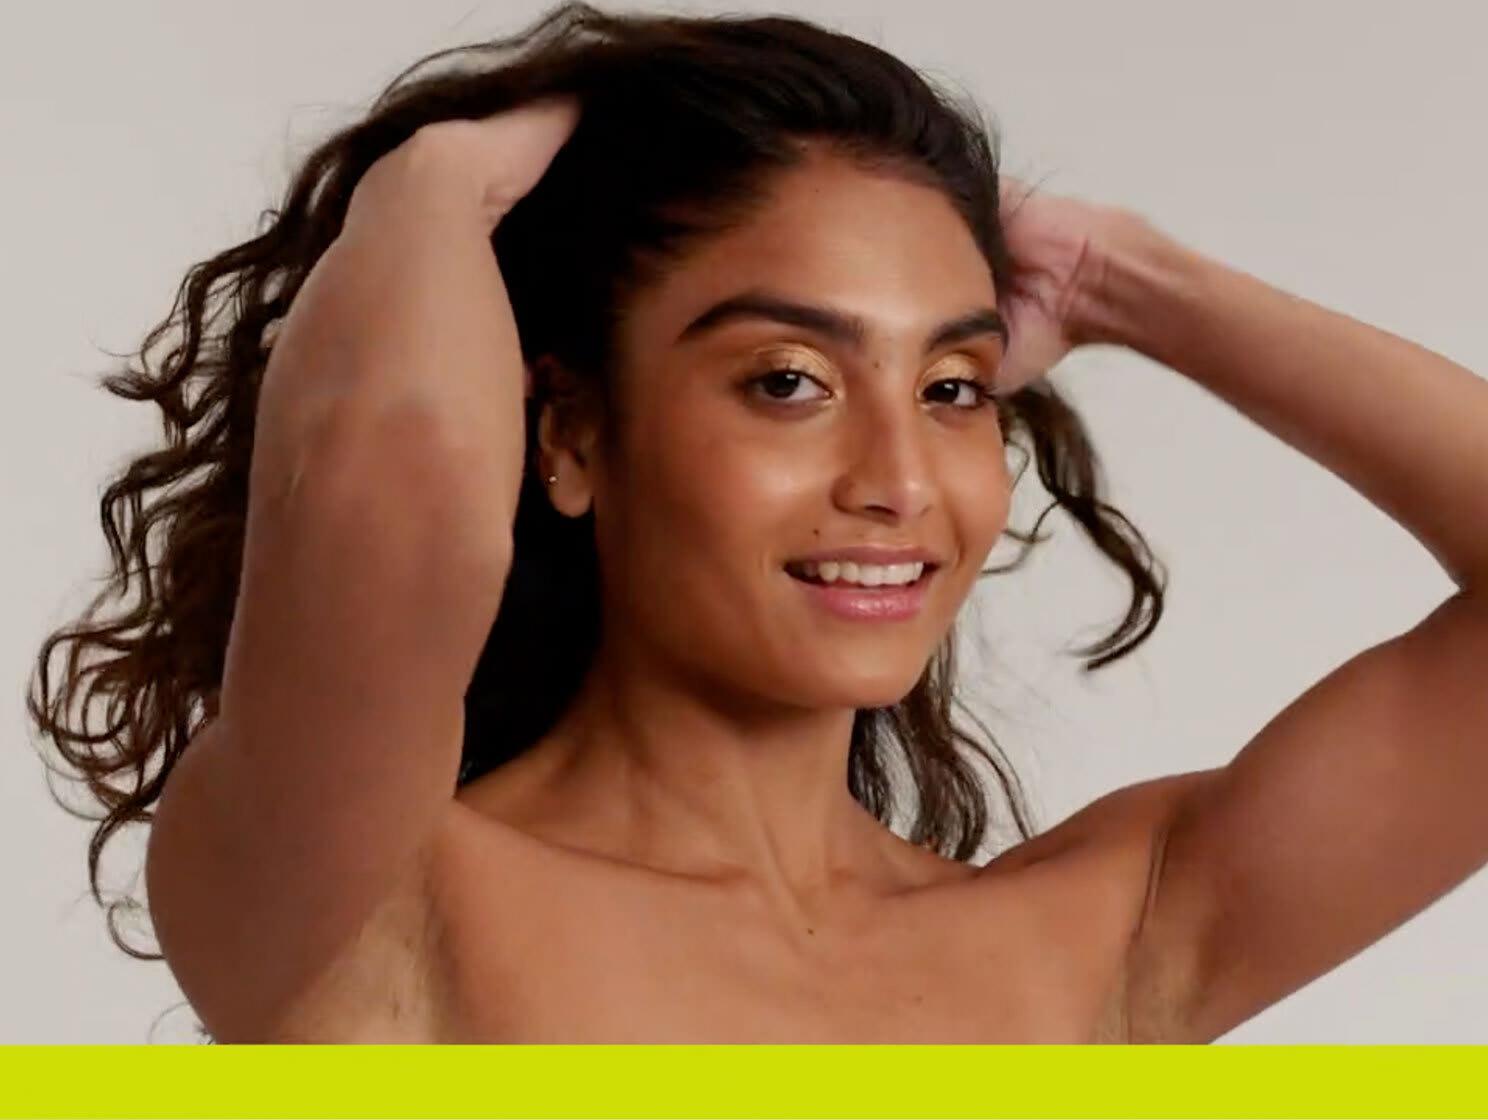 woman in shower washing dark curly hair